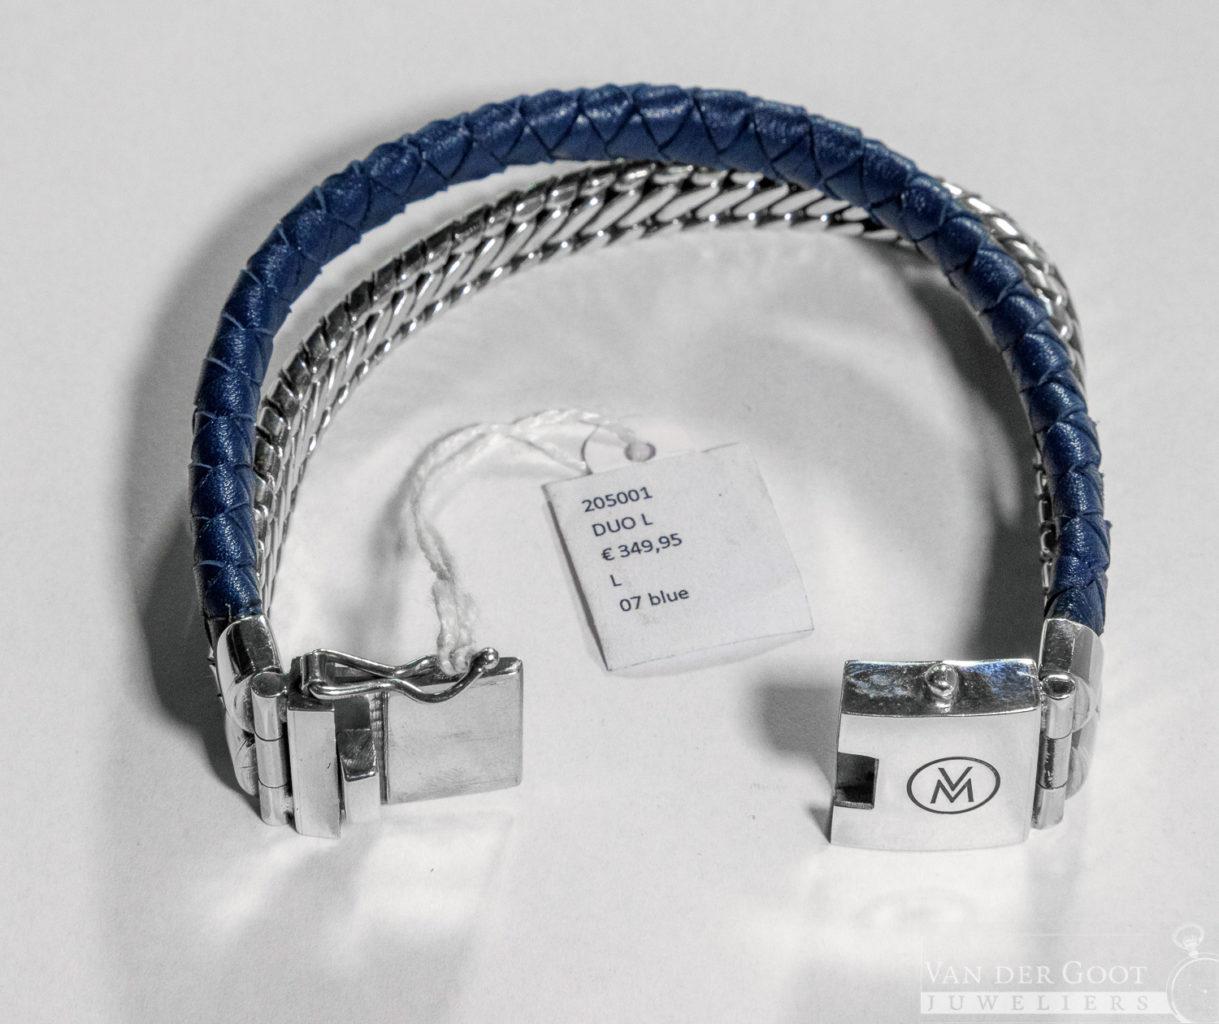 Van Mispelaar Armband 205001 - Duo L Maat L  €349,95